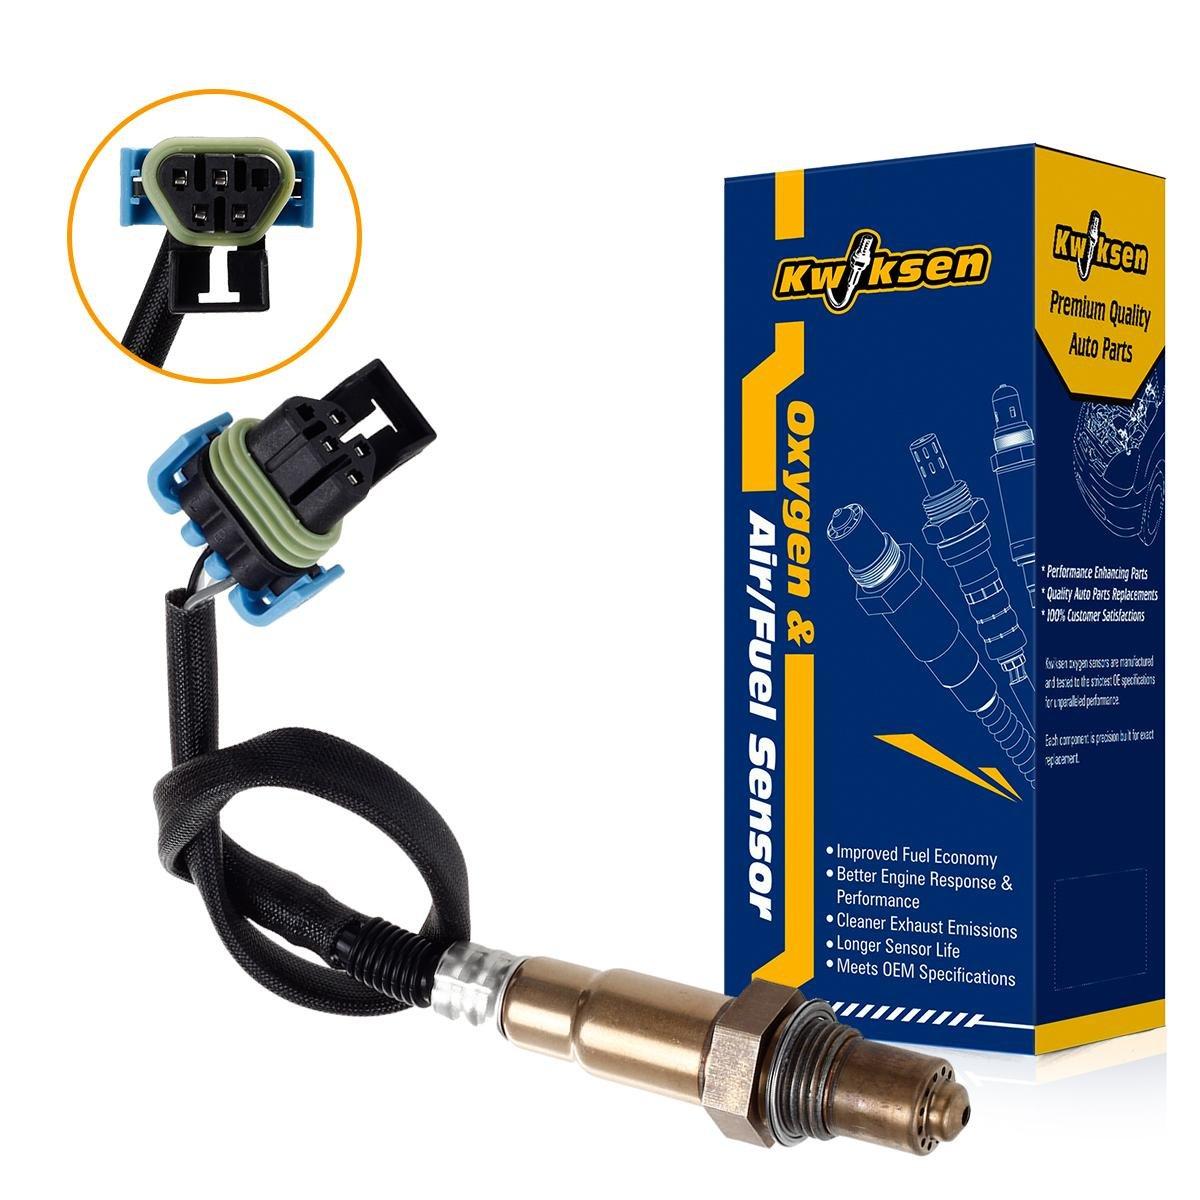 Kwiksen Heated O2 Oxygen Sensor 234-4815 Replacement for Buick LaCrosse 3.6L//GMC Terrain Saab 9-4X 3.0L 2011